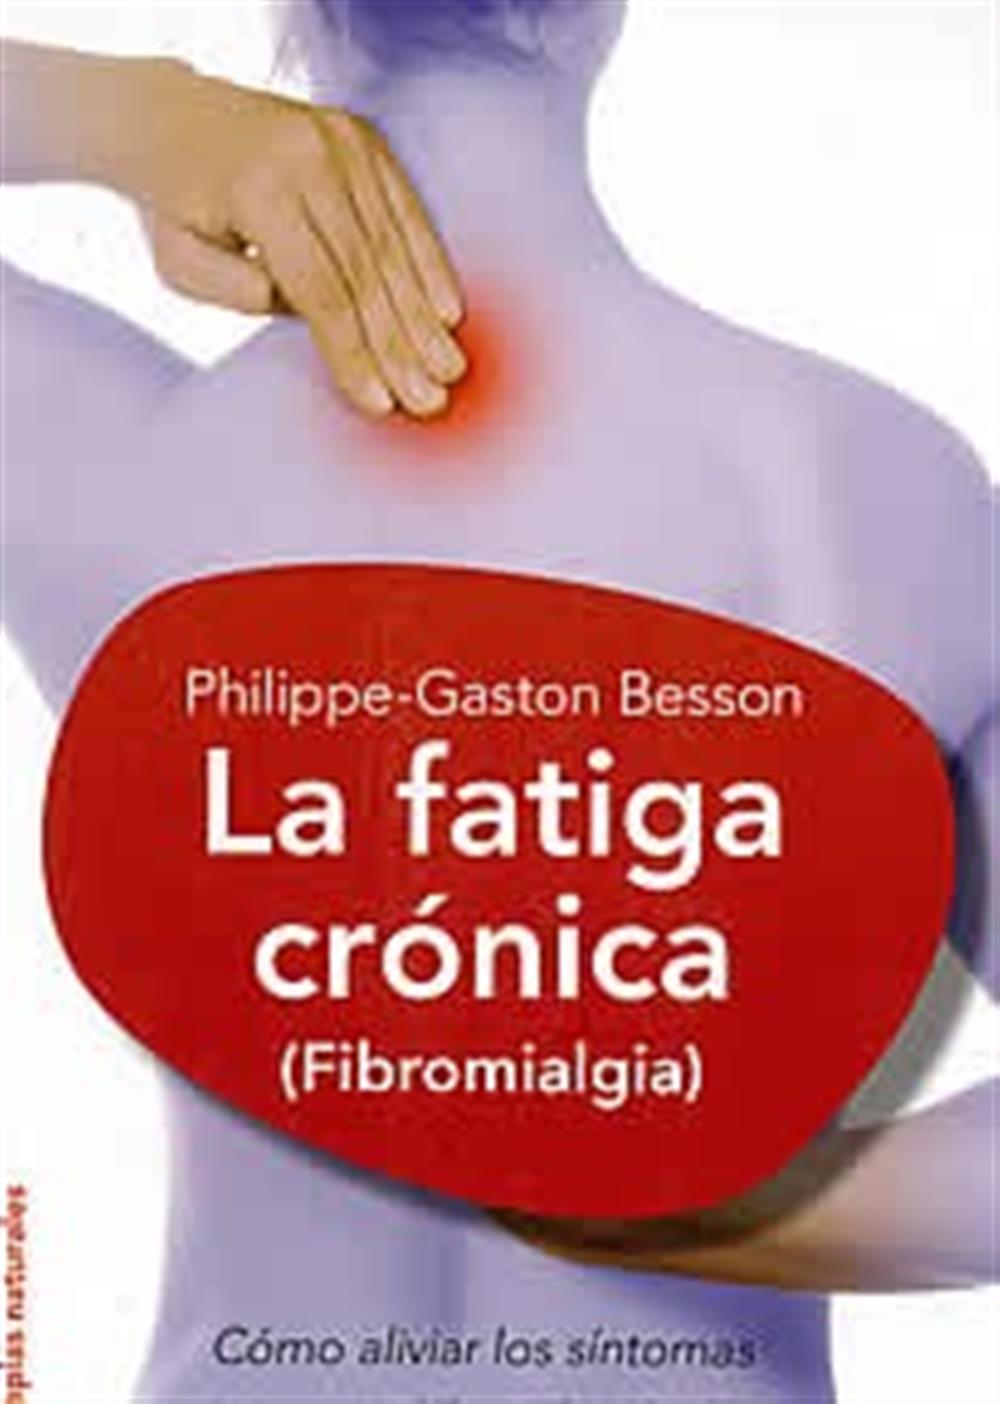 La fatiga crónica (fibromialgia)